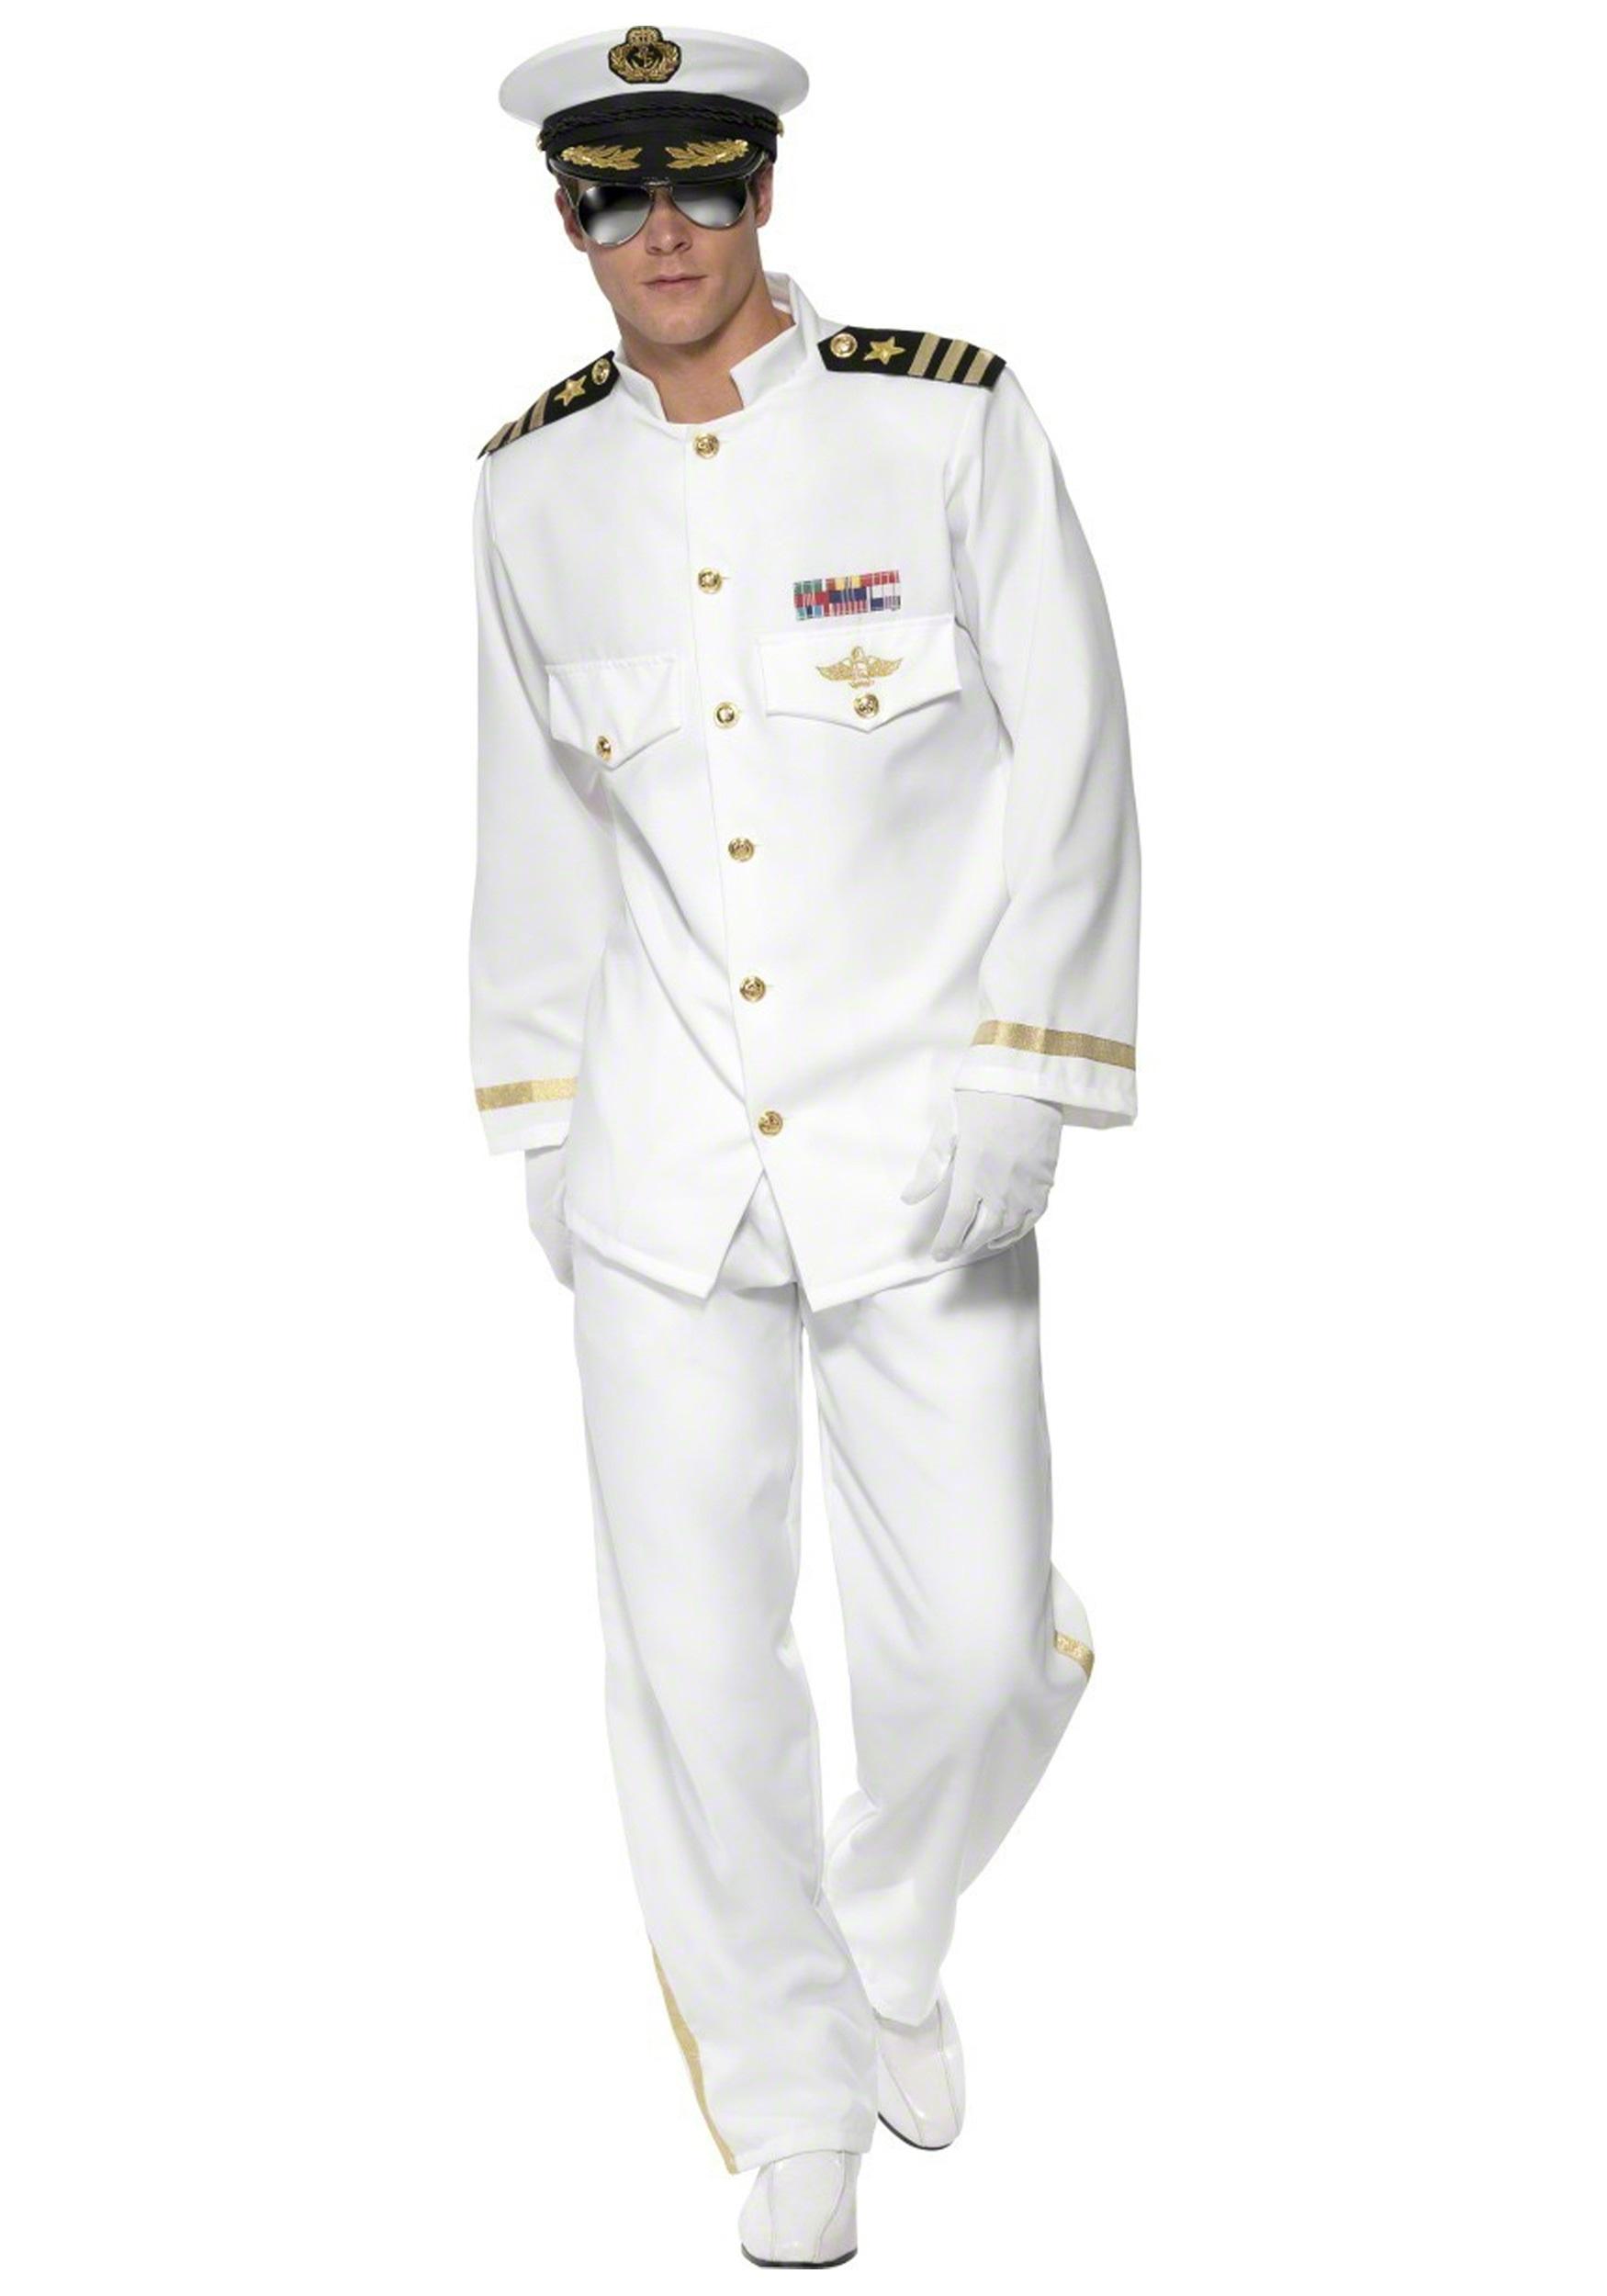 182e8663690cc Mens Deluxe Captain Costume - Navy Uniform Costumes